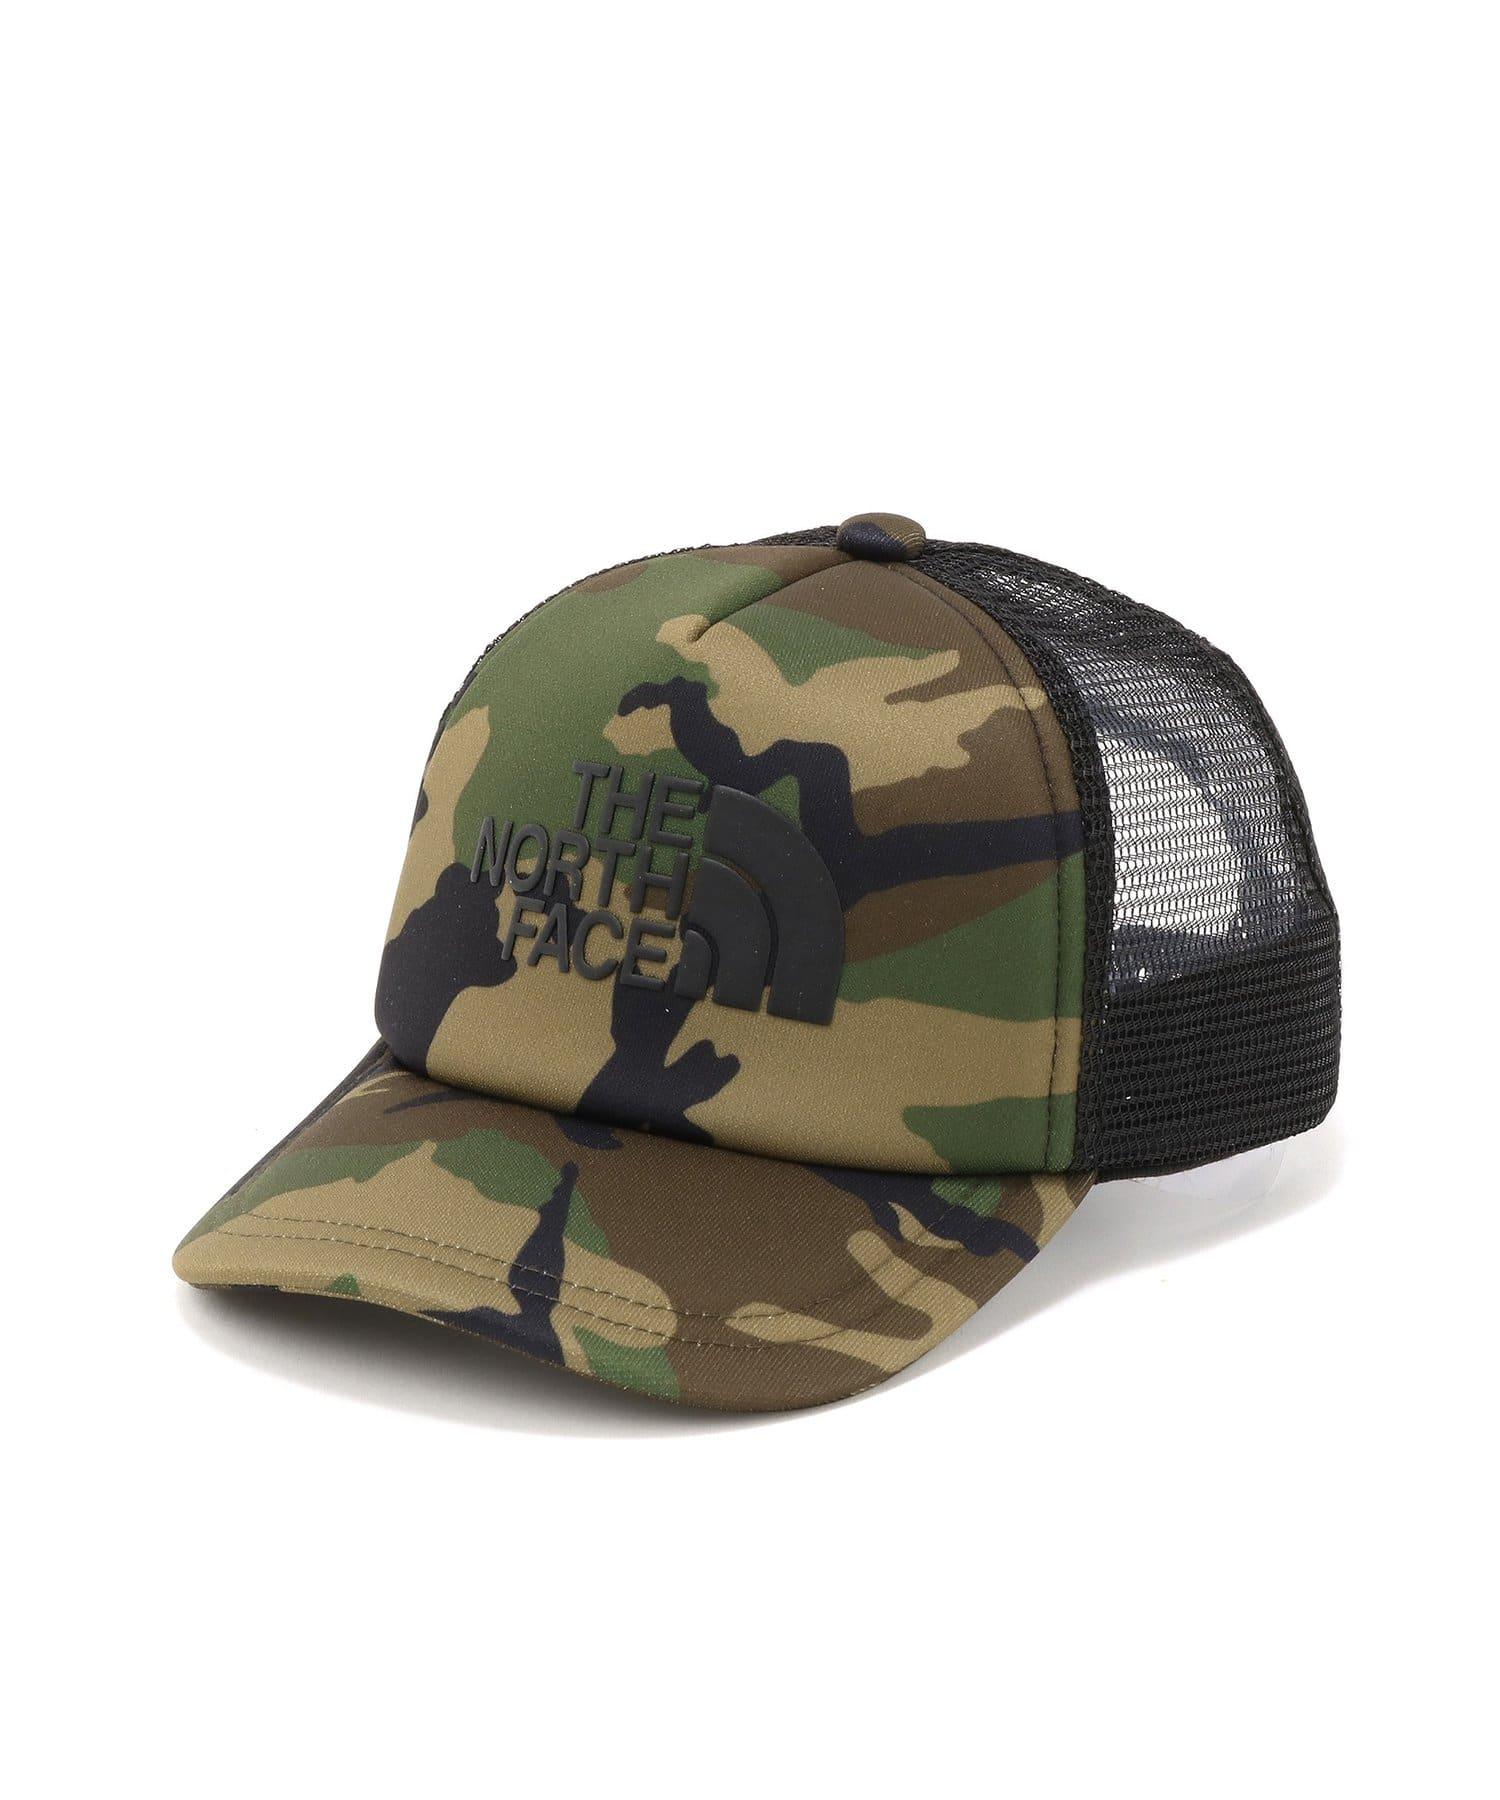 CIAOPANIC TYPY(チャオパニックティピー) キッズ LOGO MESH CAP (KID'S) オリーブ